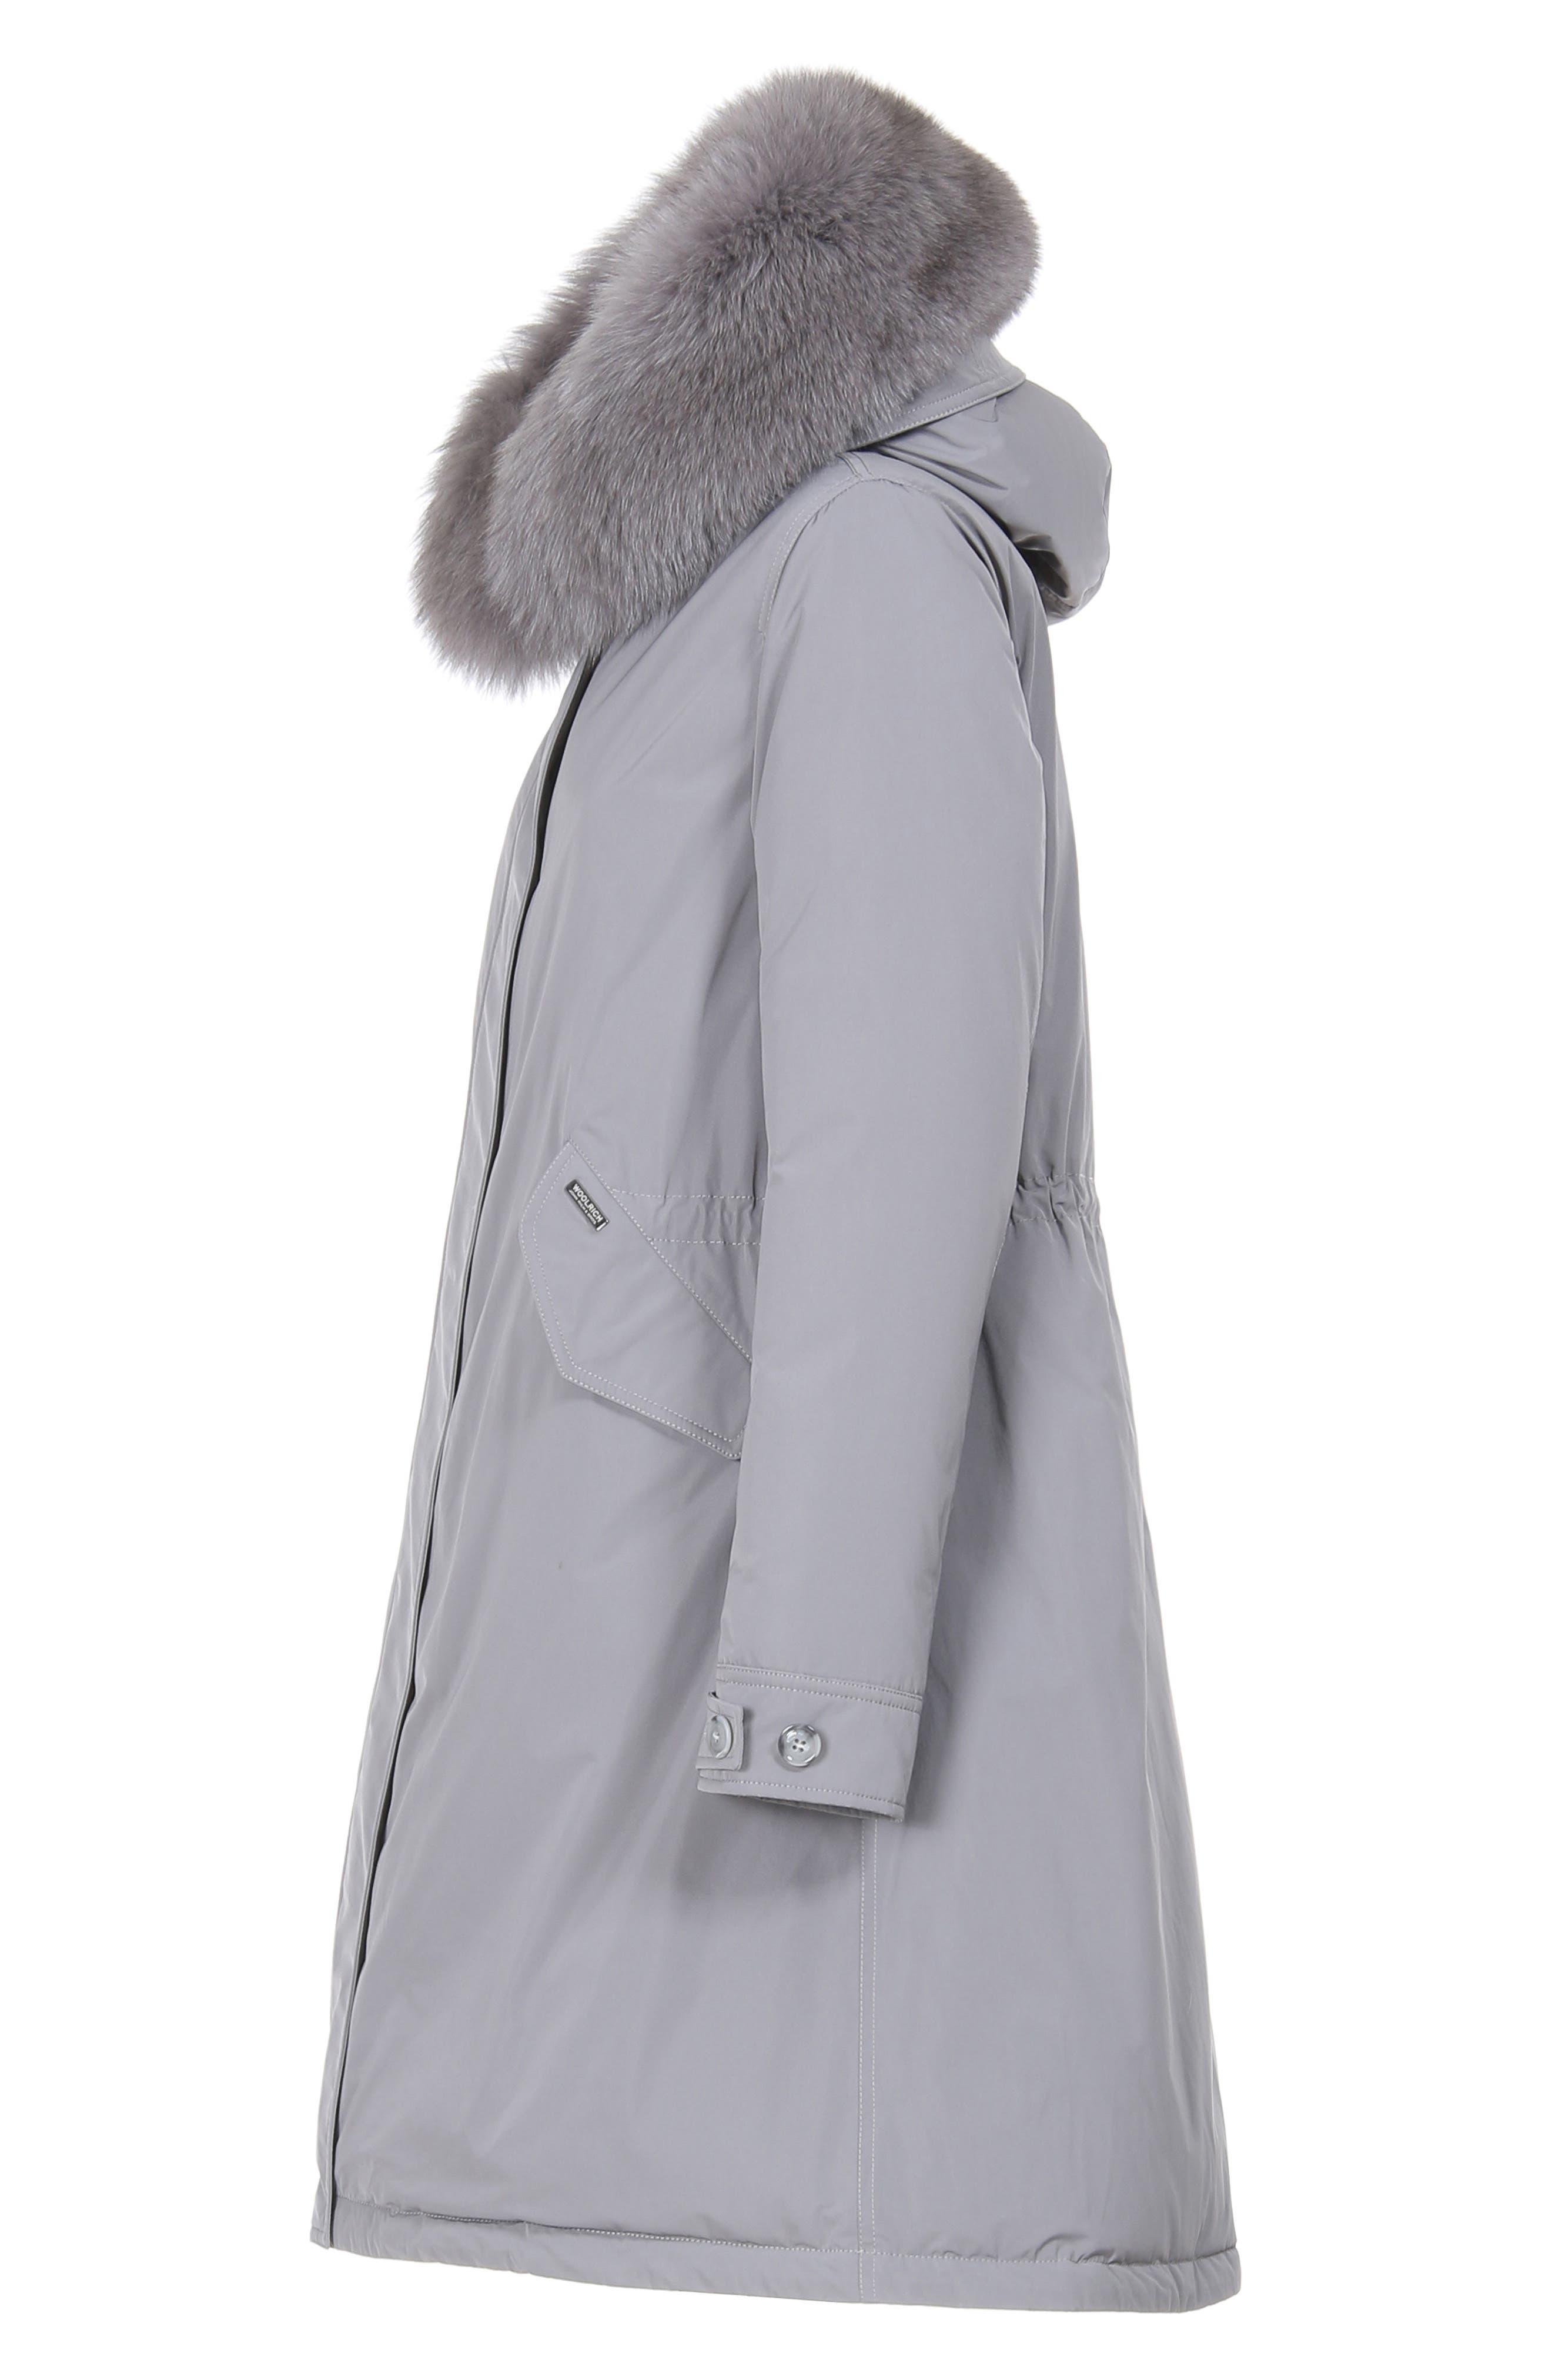 Keystone Down Parka with Genuine Fox Fur Trim,                             Alternate thumbnail 6, color,                             URBAN GREY